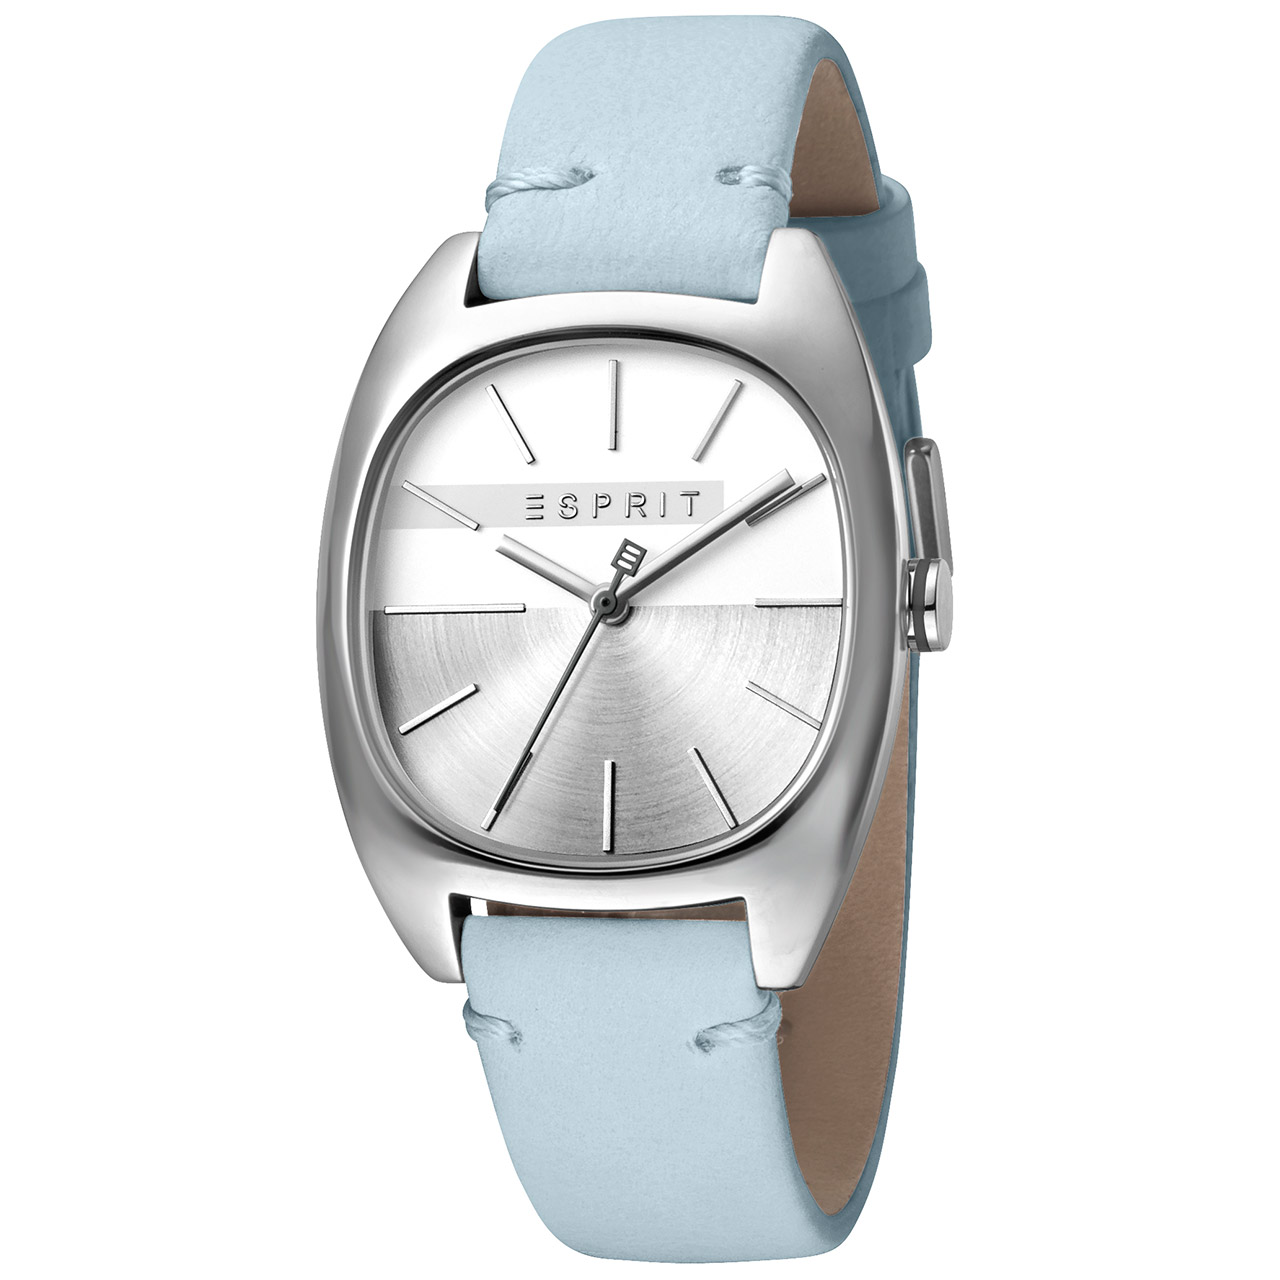 ساعت مچی عقربه ای زنانه اسپریت مدل ES1L038L0035 10